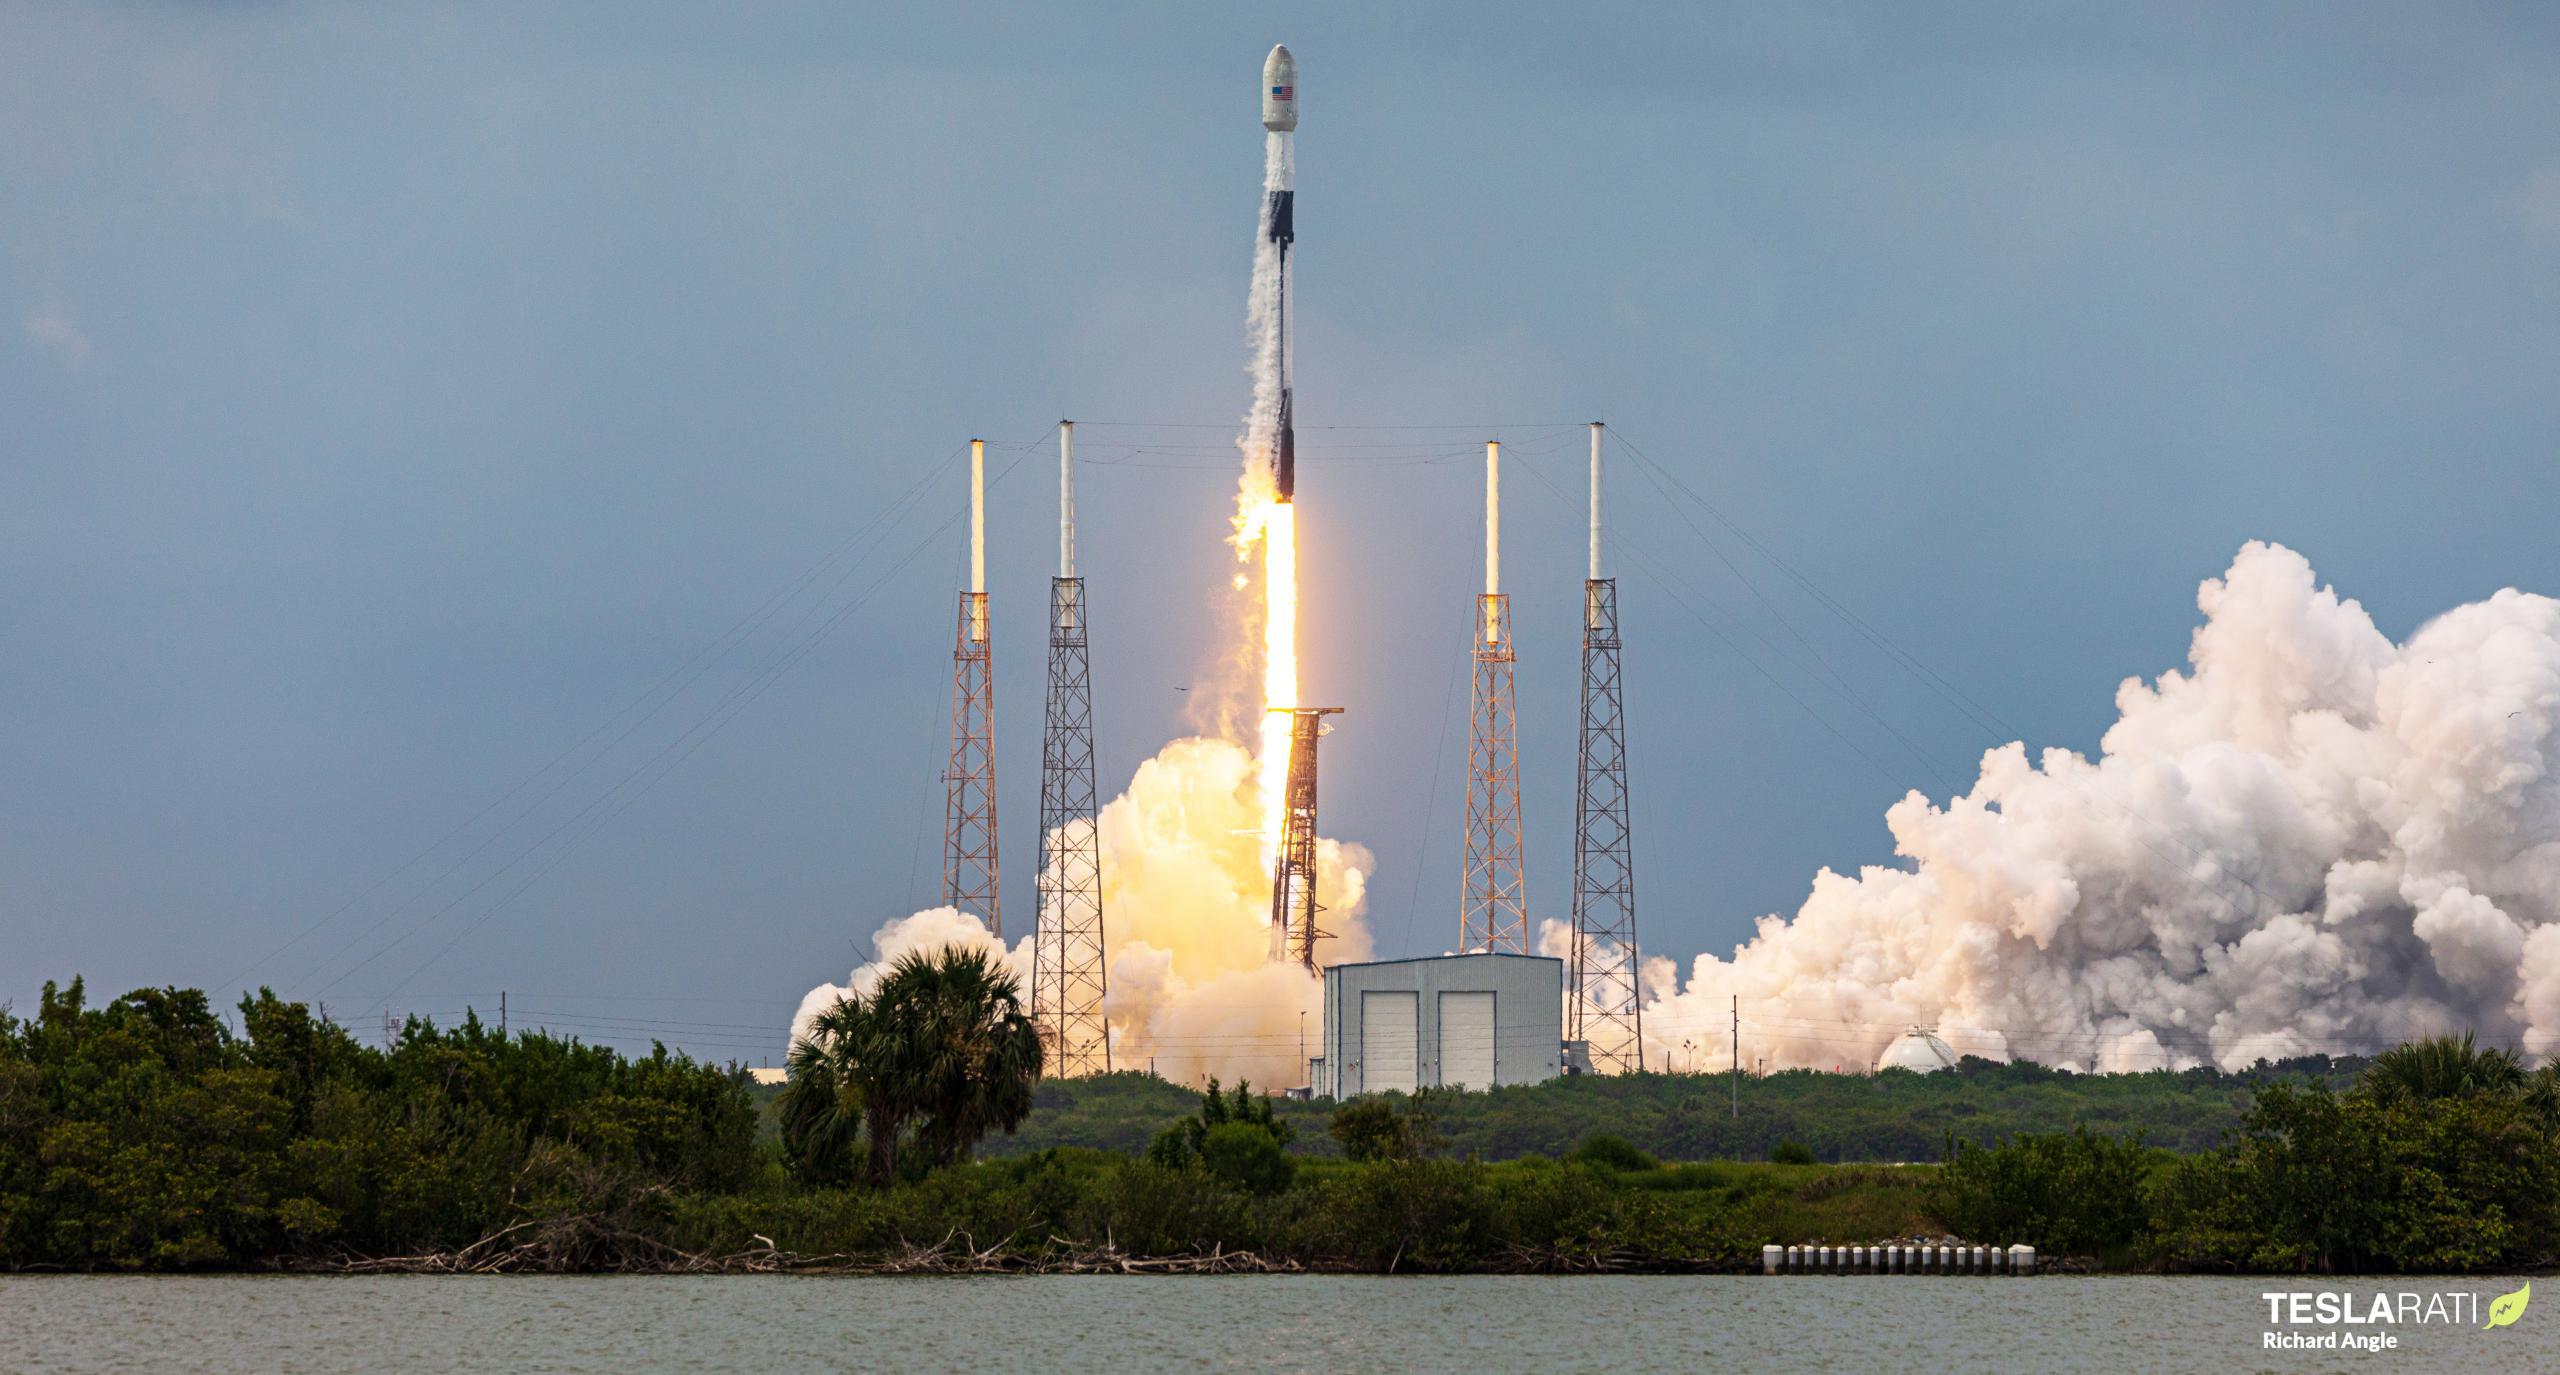 Transporter-2 Falcon 9 B1060 063021 (Richard Angle) launch 1 (c)